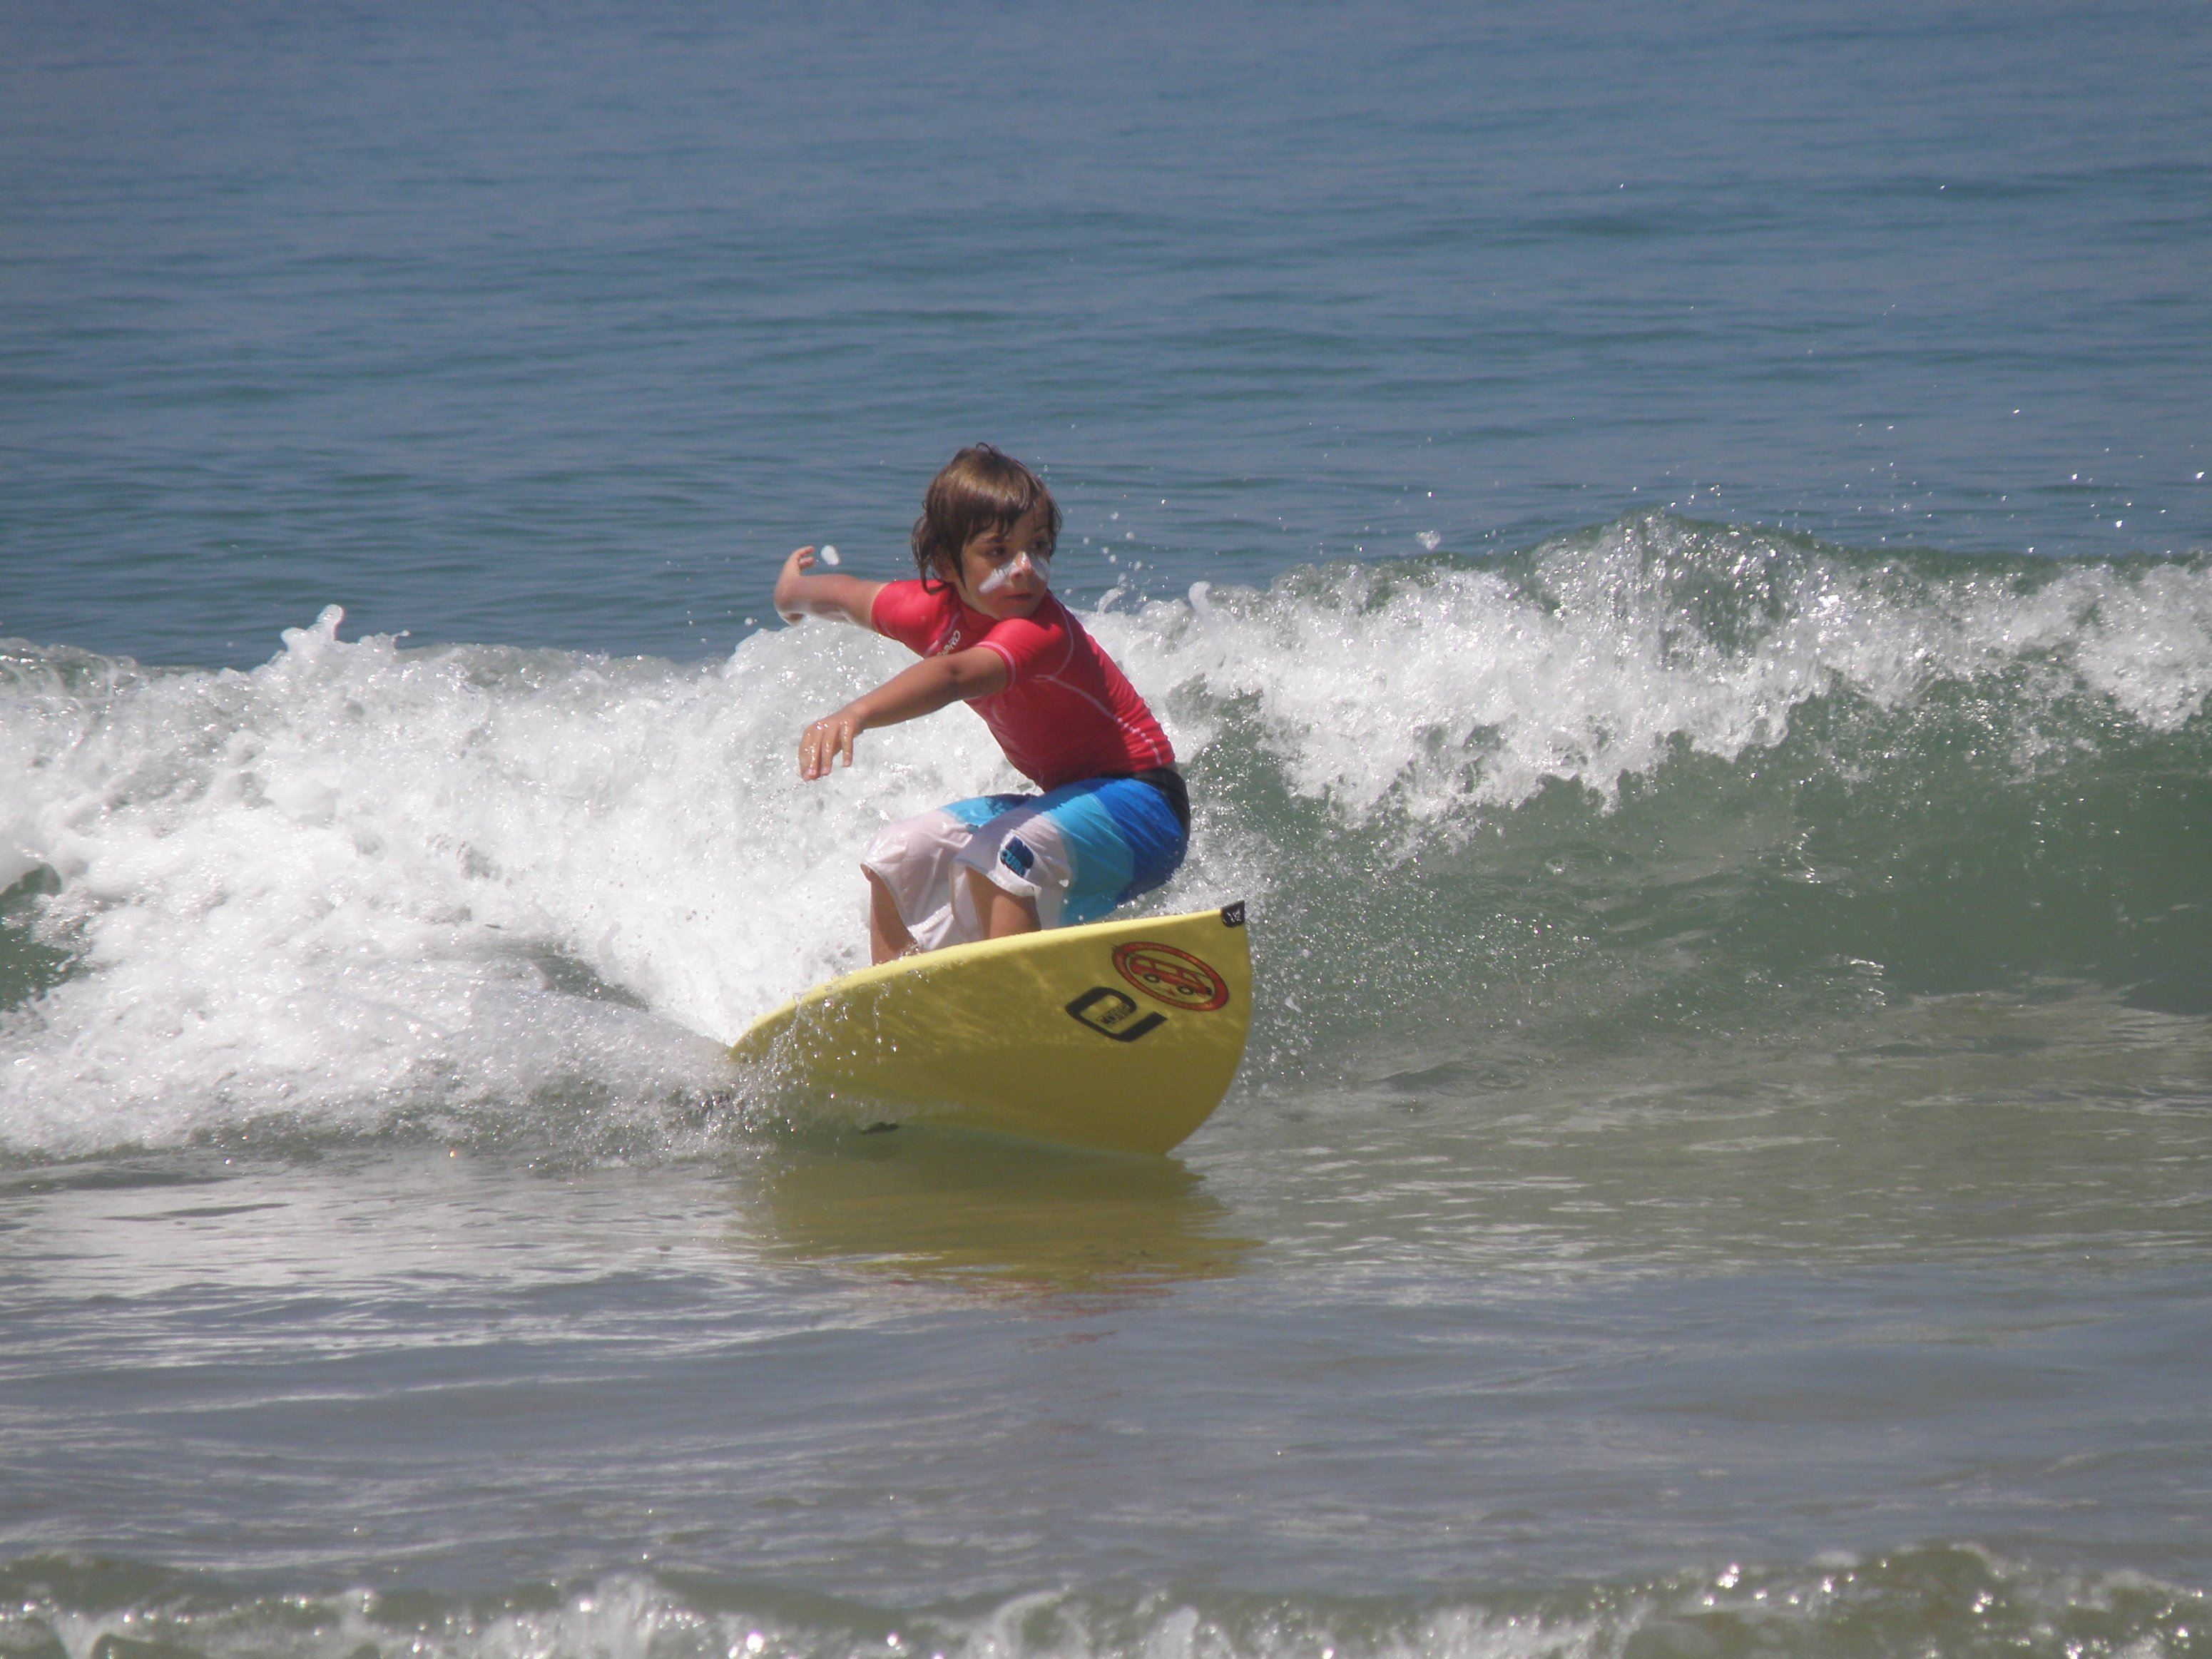 Lagoondy Surf School, Côte des Basques beach, Biarritz